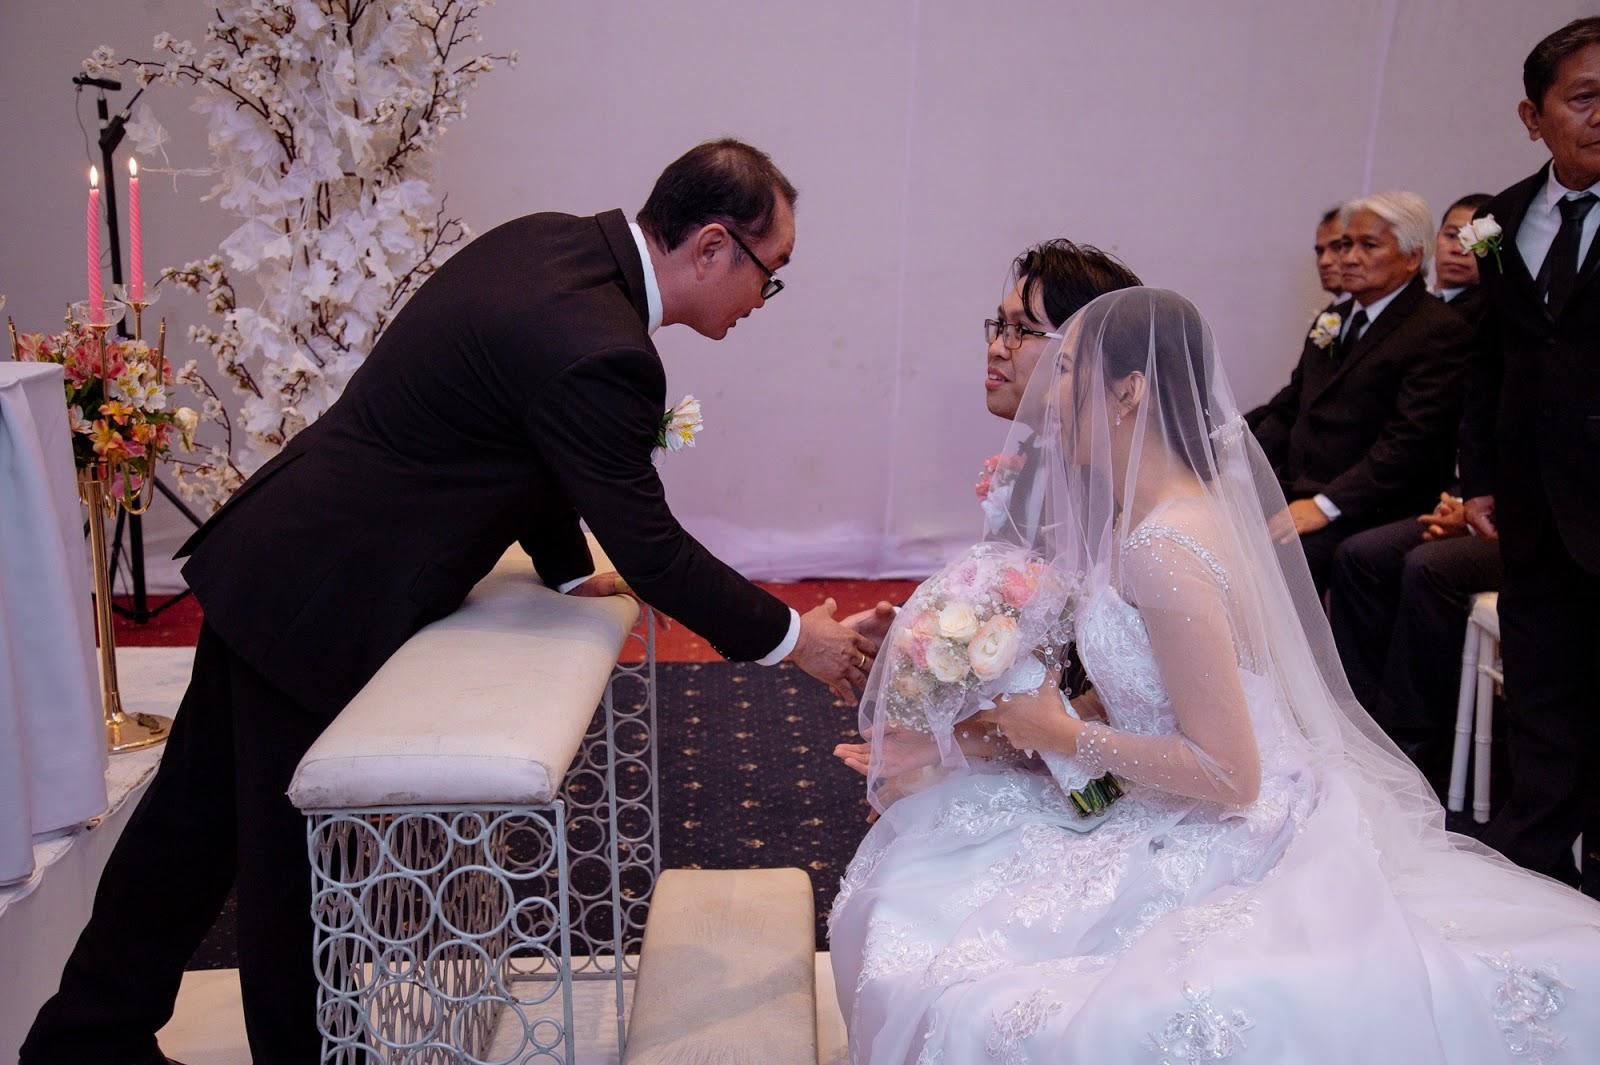 our Christian wedding